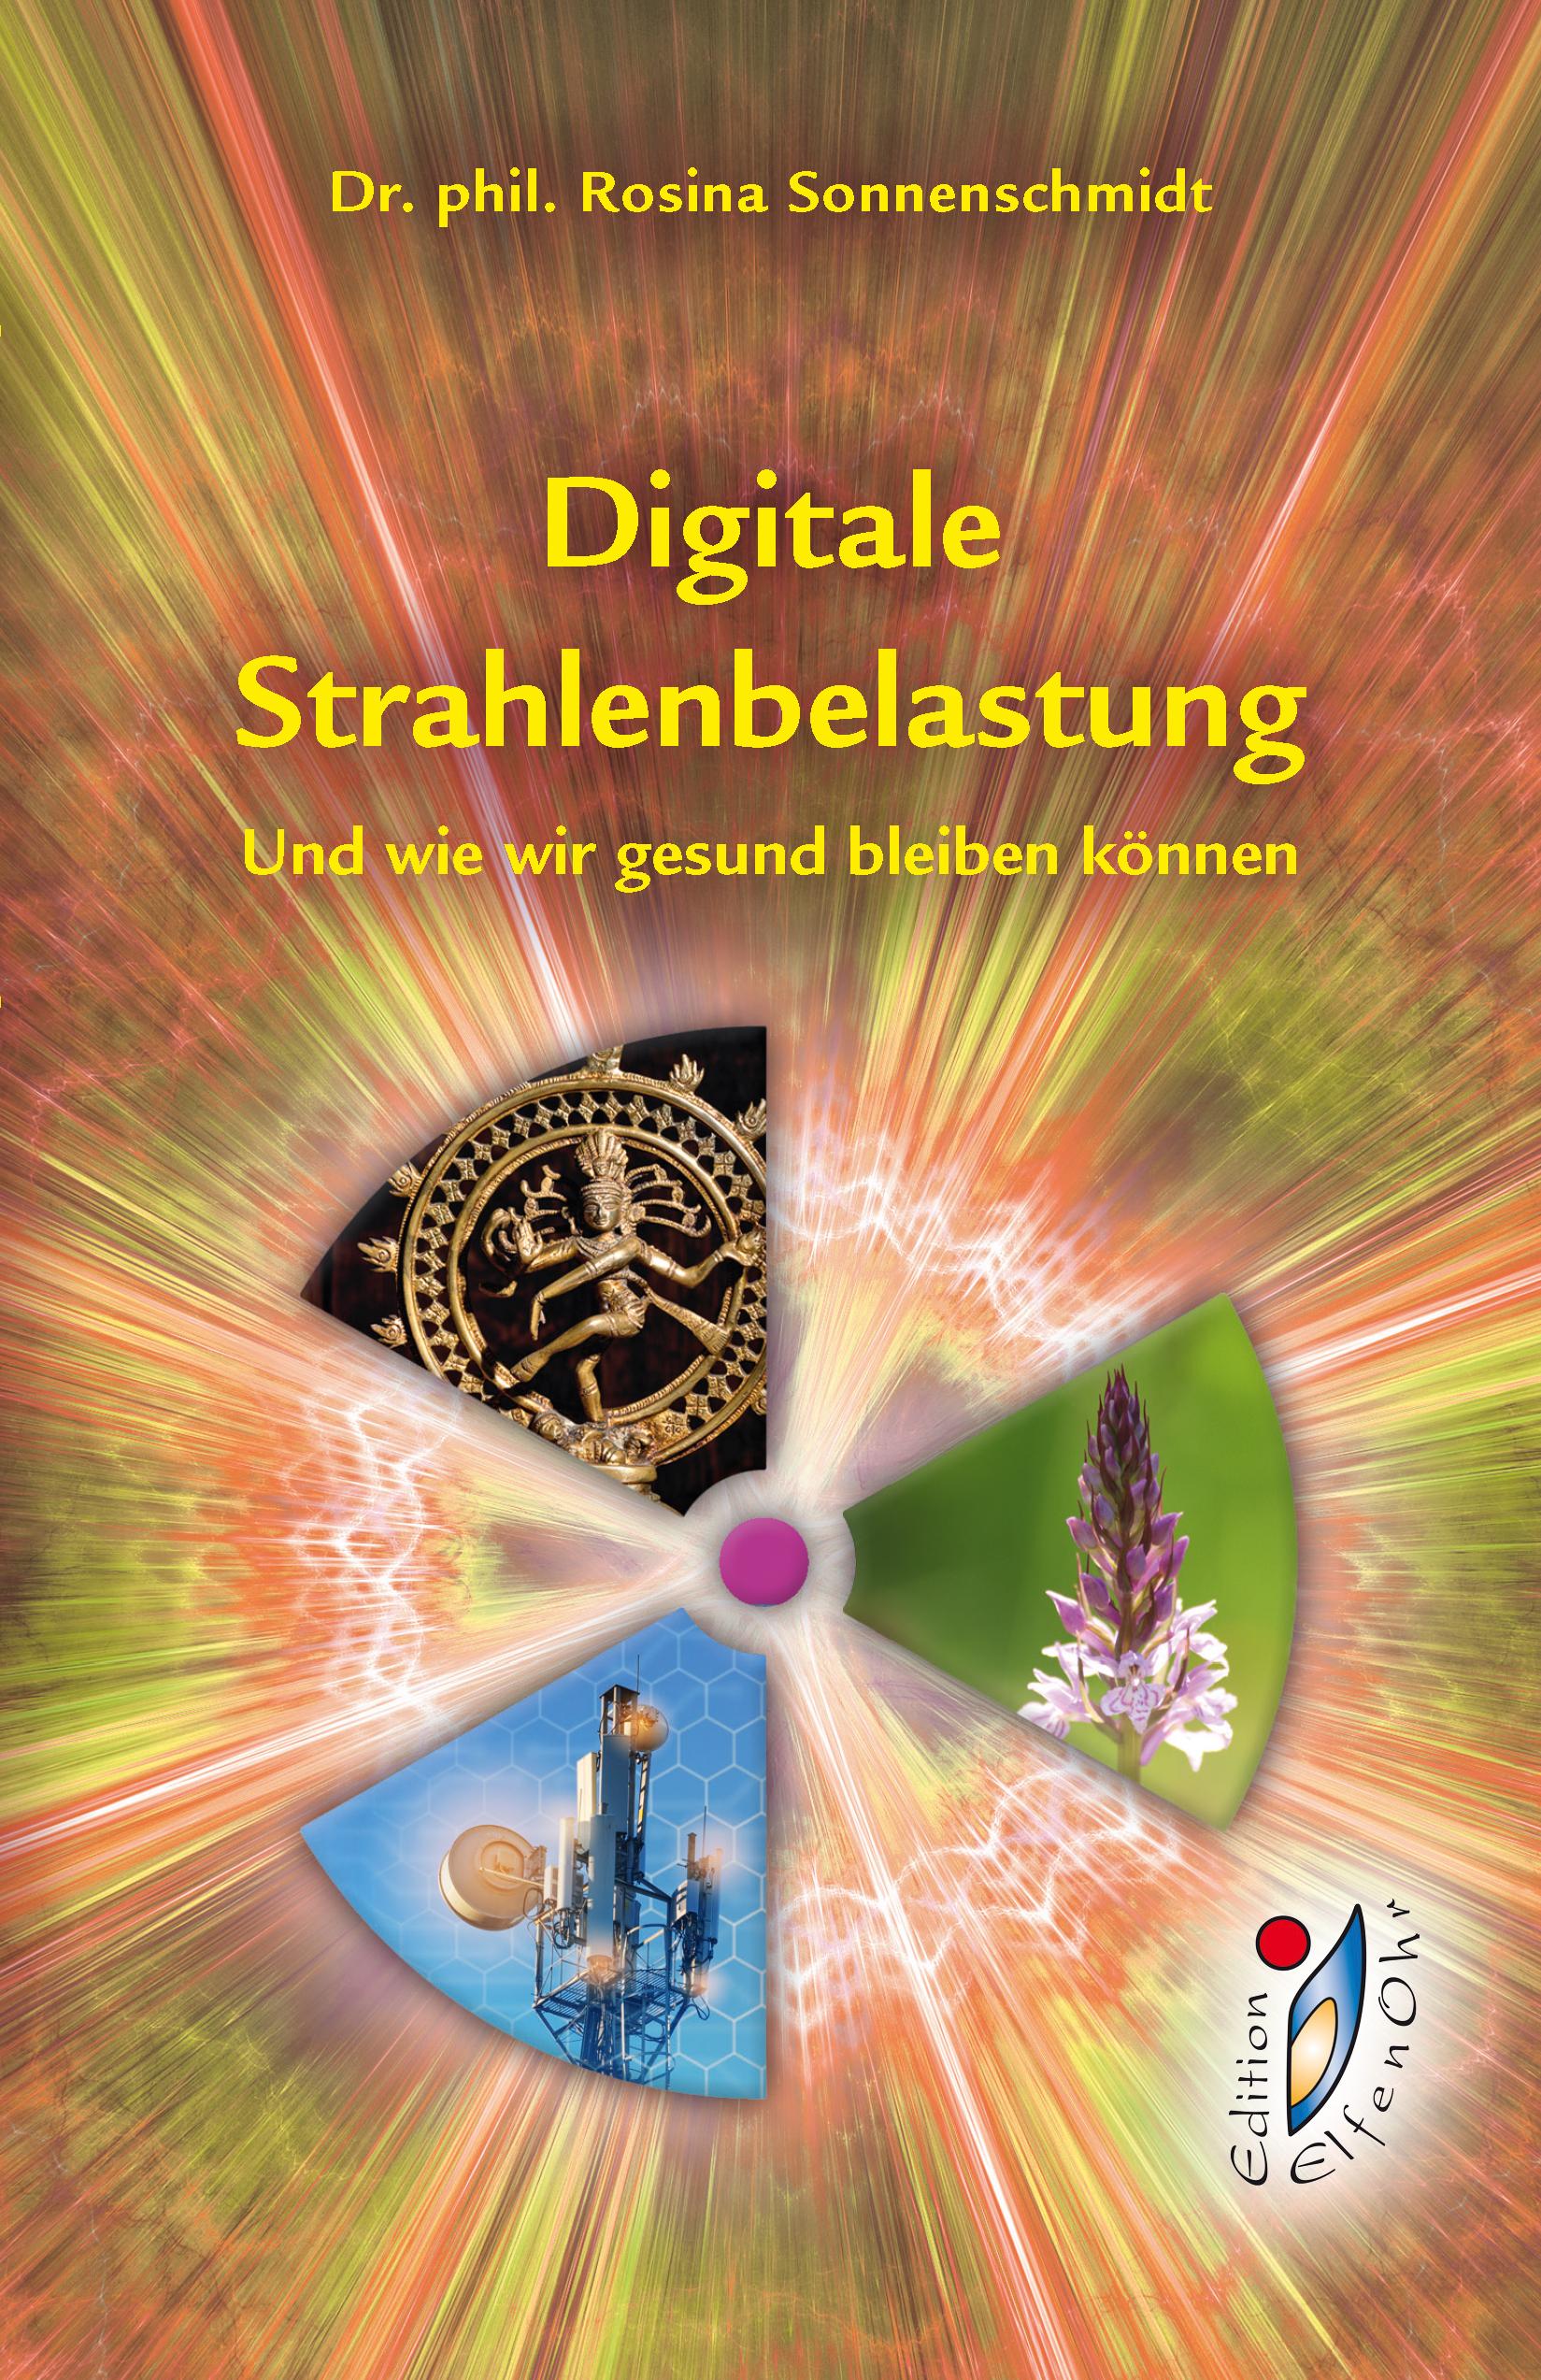 Digitale Strahlenbelastung